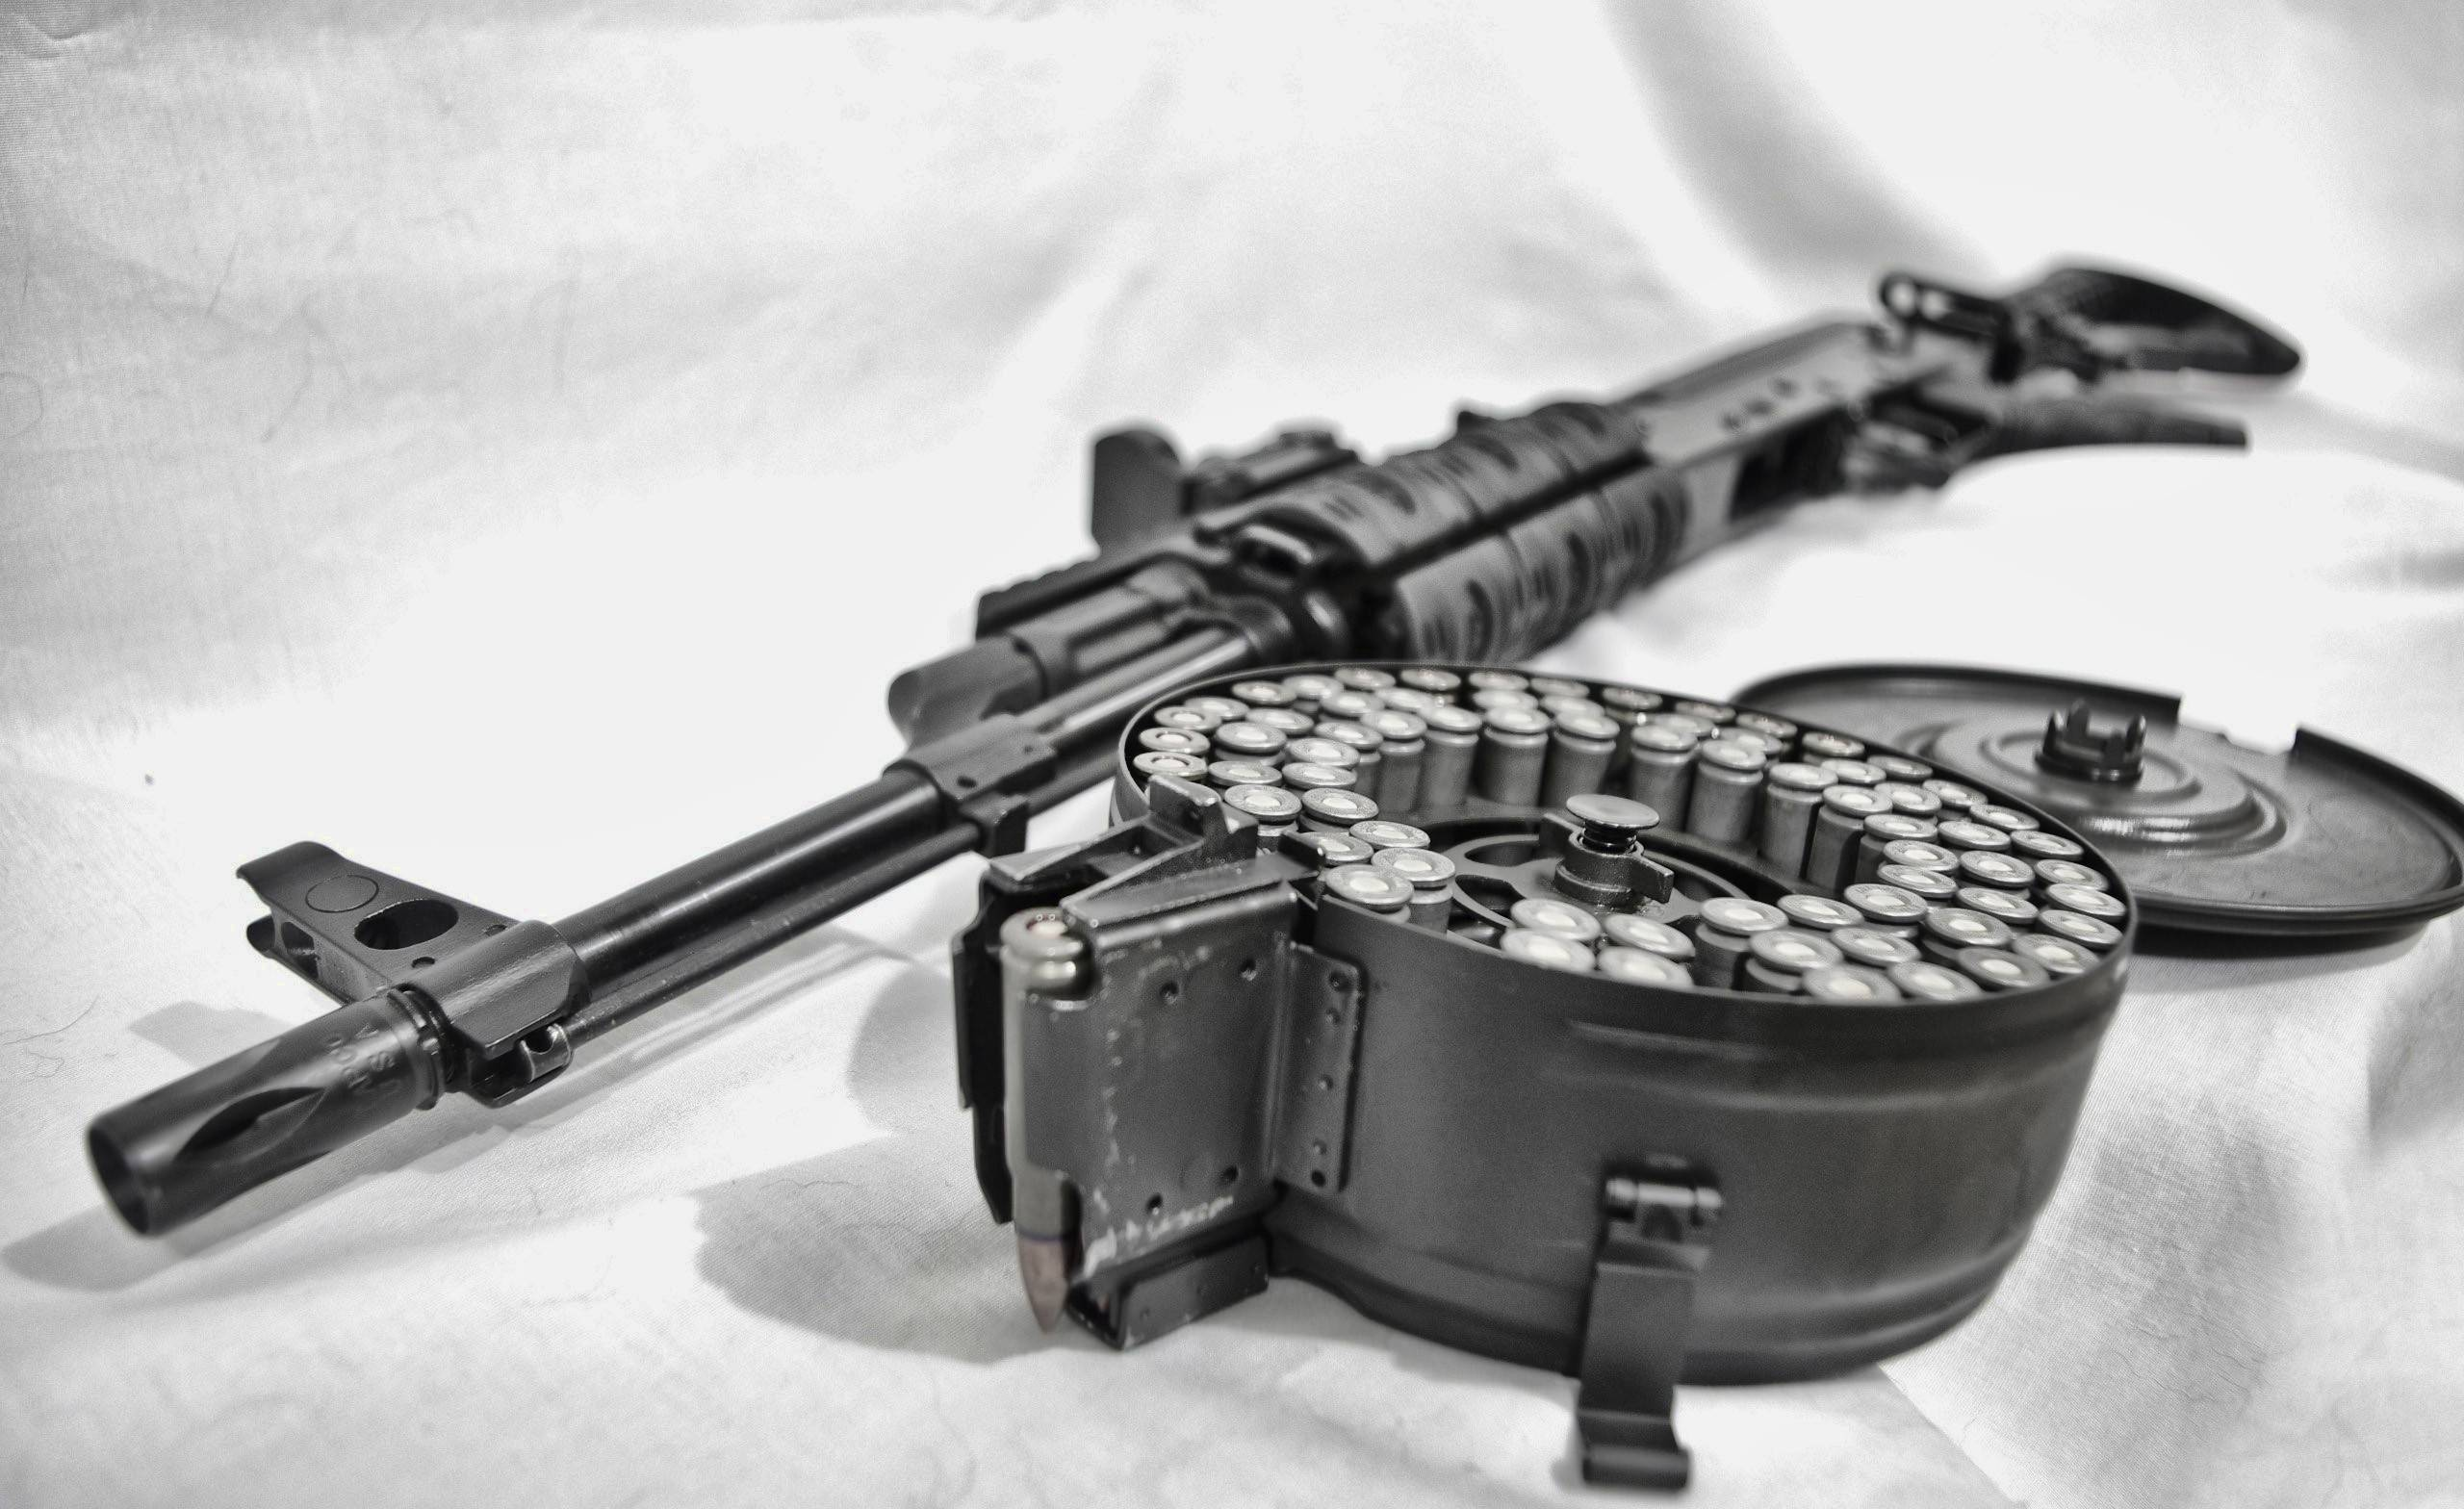 Machine Gun 25601568 Wallpaper 2168113 2560x1568